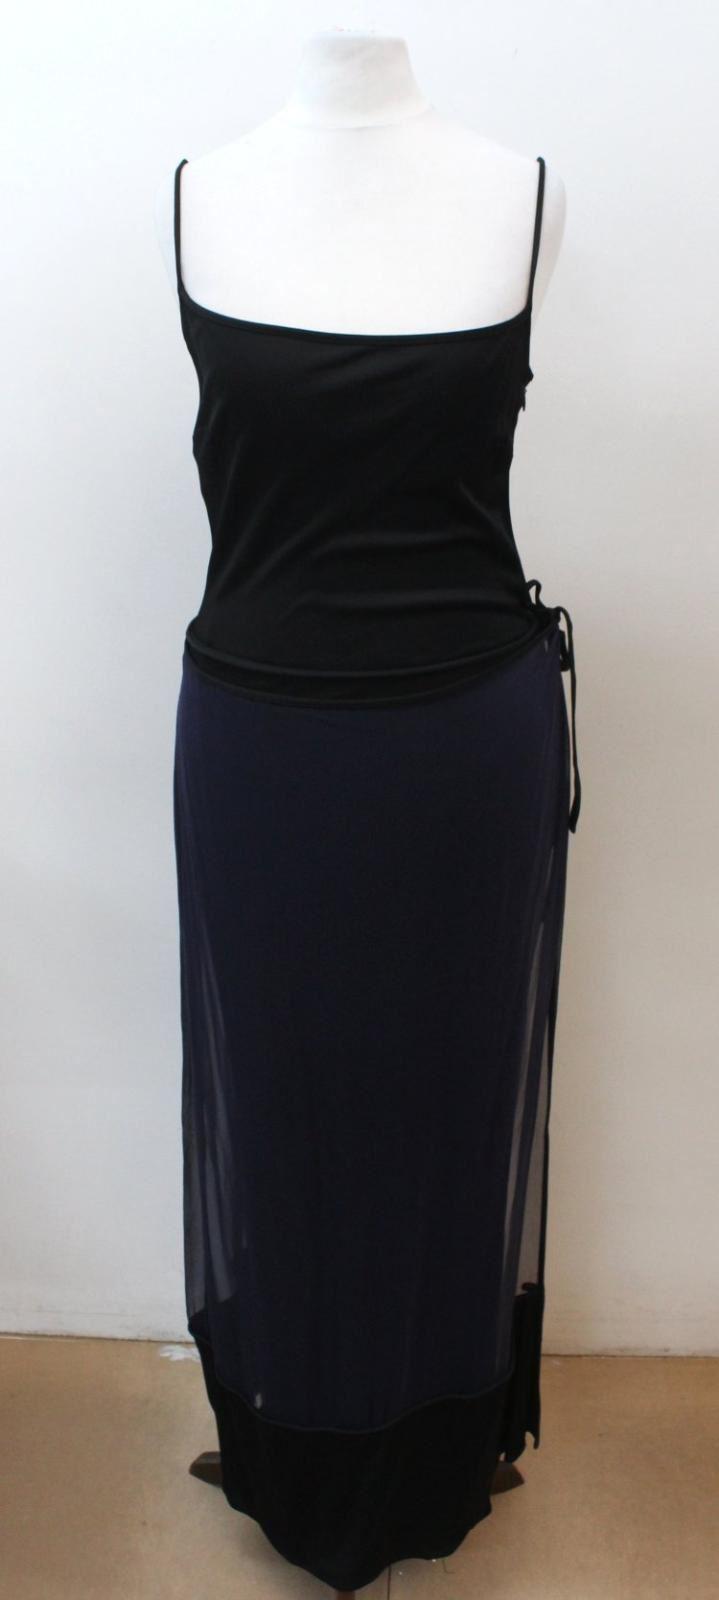 Ladies-Black-amp-Navy-Blue-Silk-Sleeveless-Sheer-Overlay-Maxi-Dress-UK10-EU38